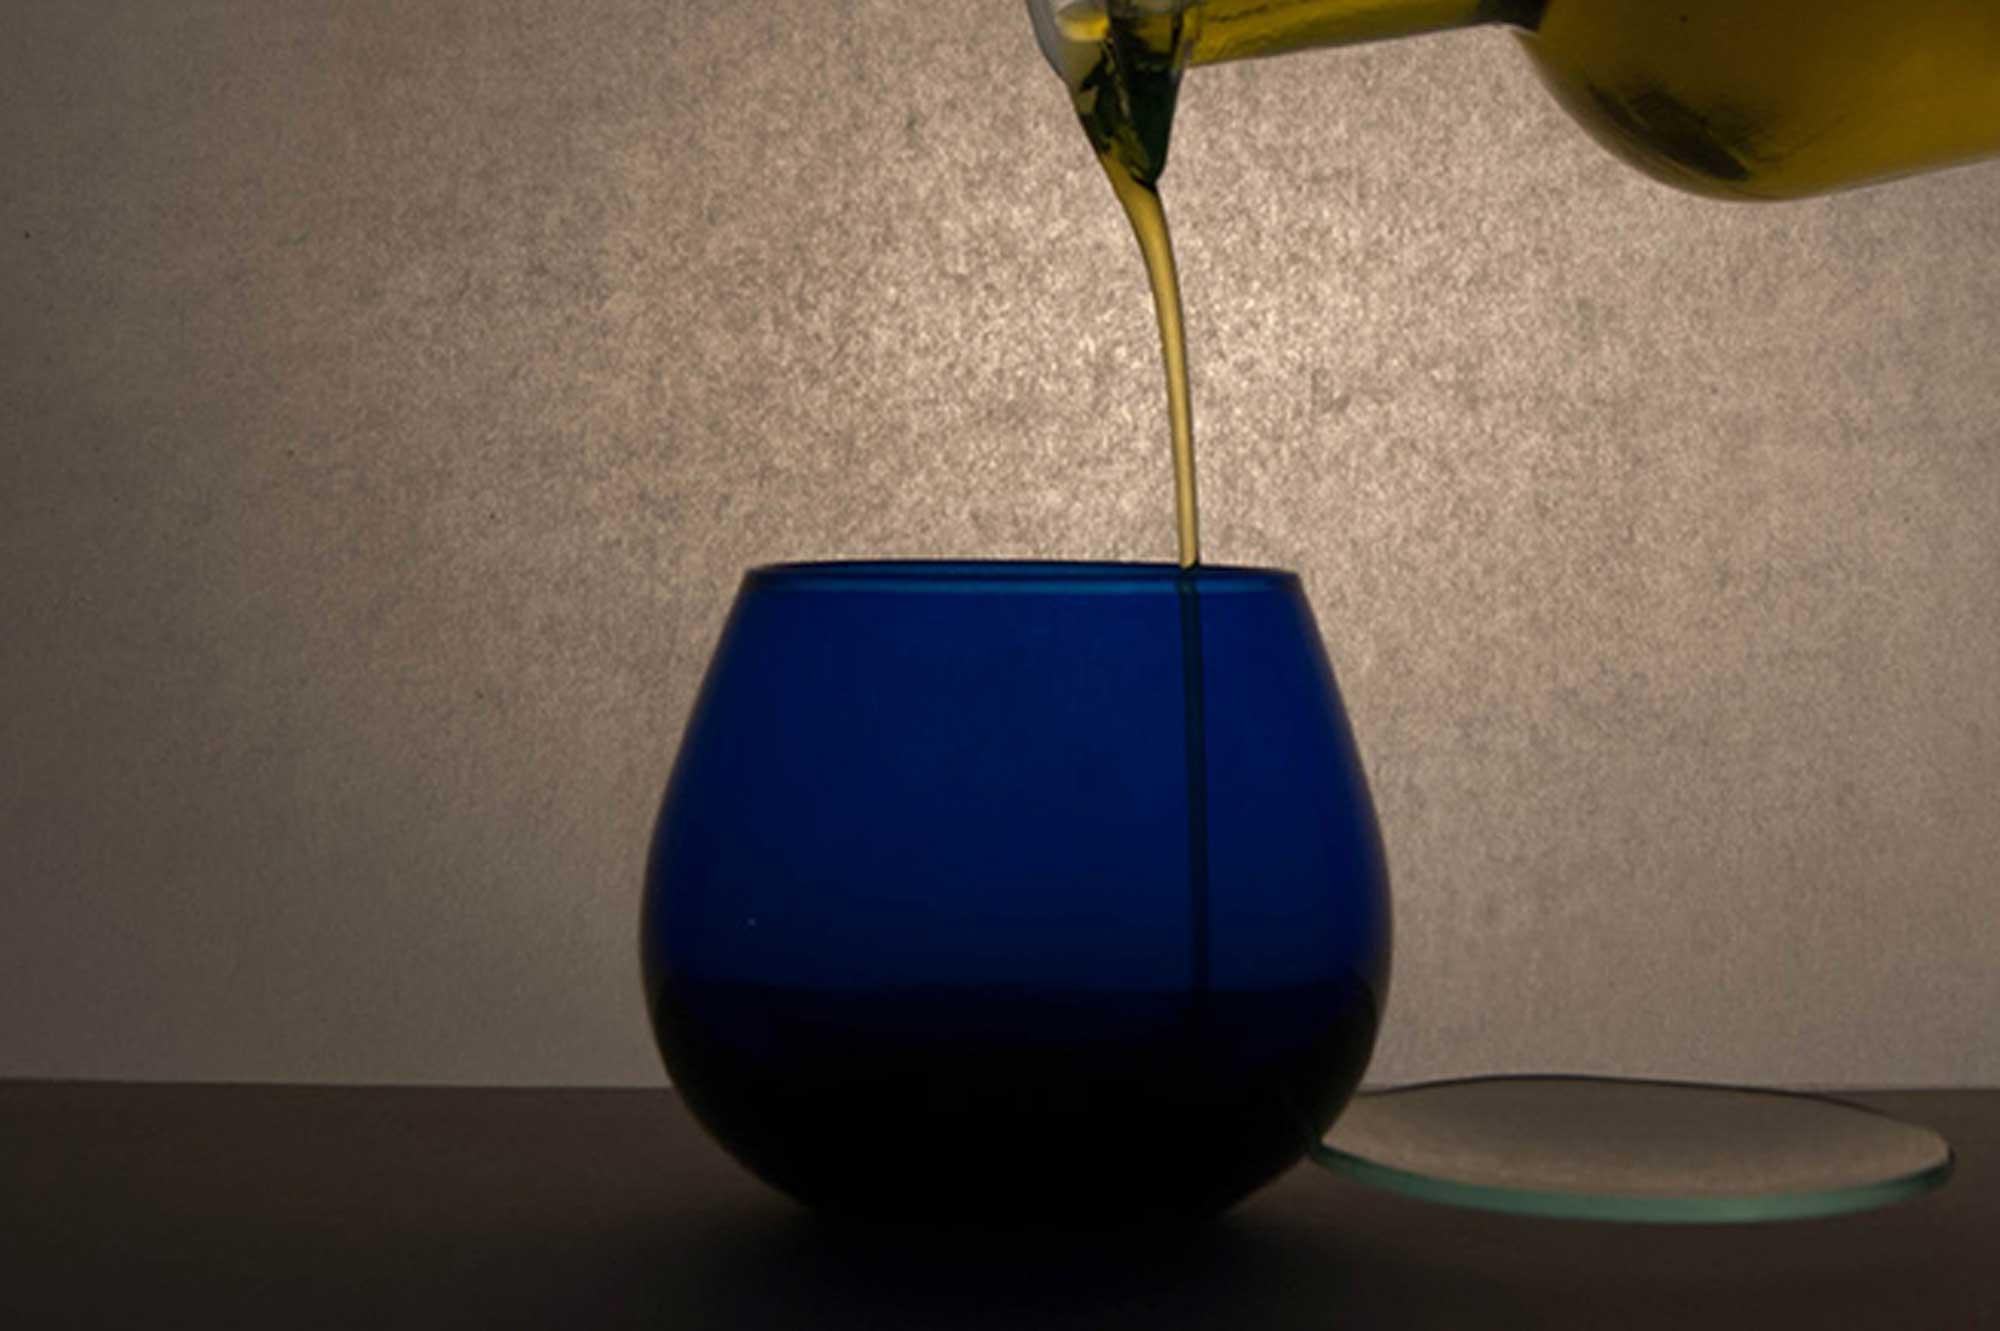 tasting blue glass extravirgin olive oil